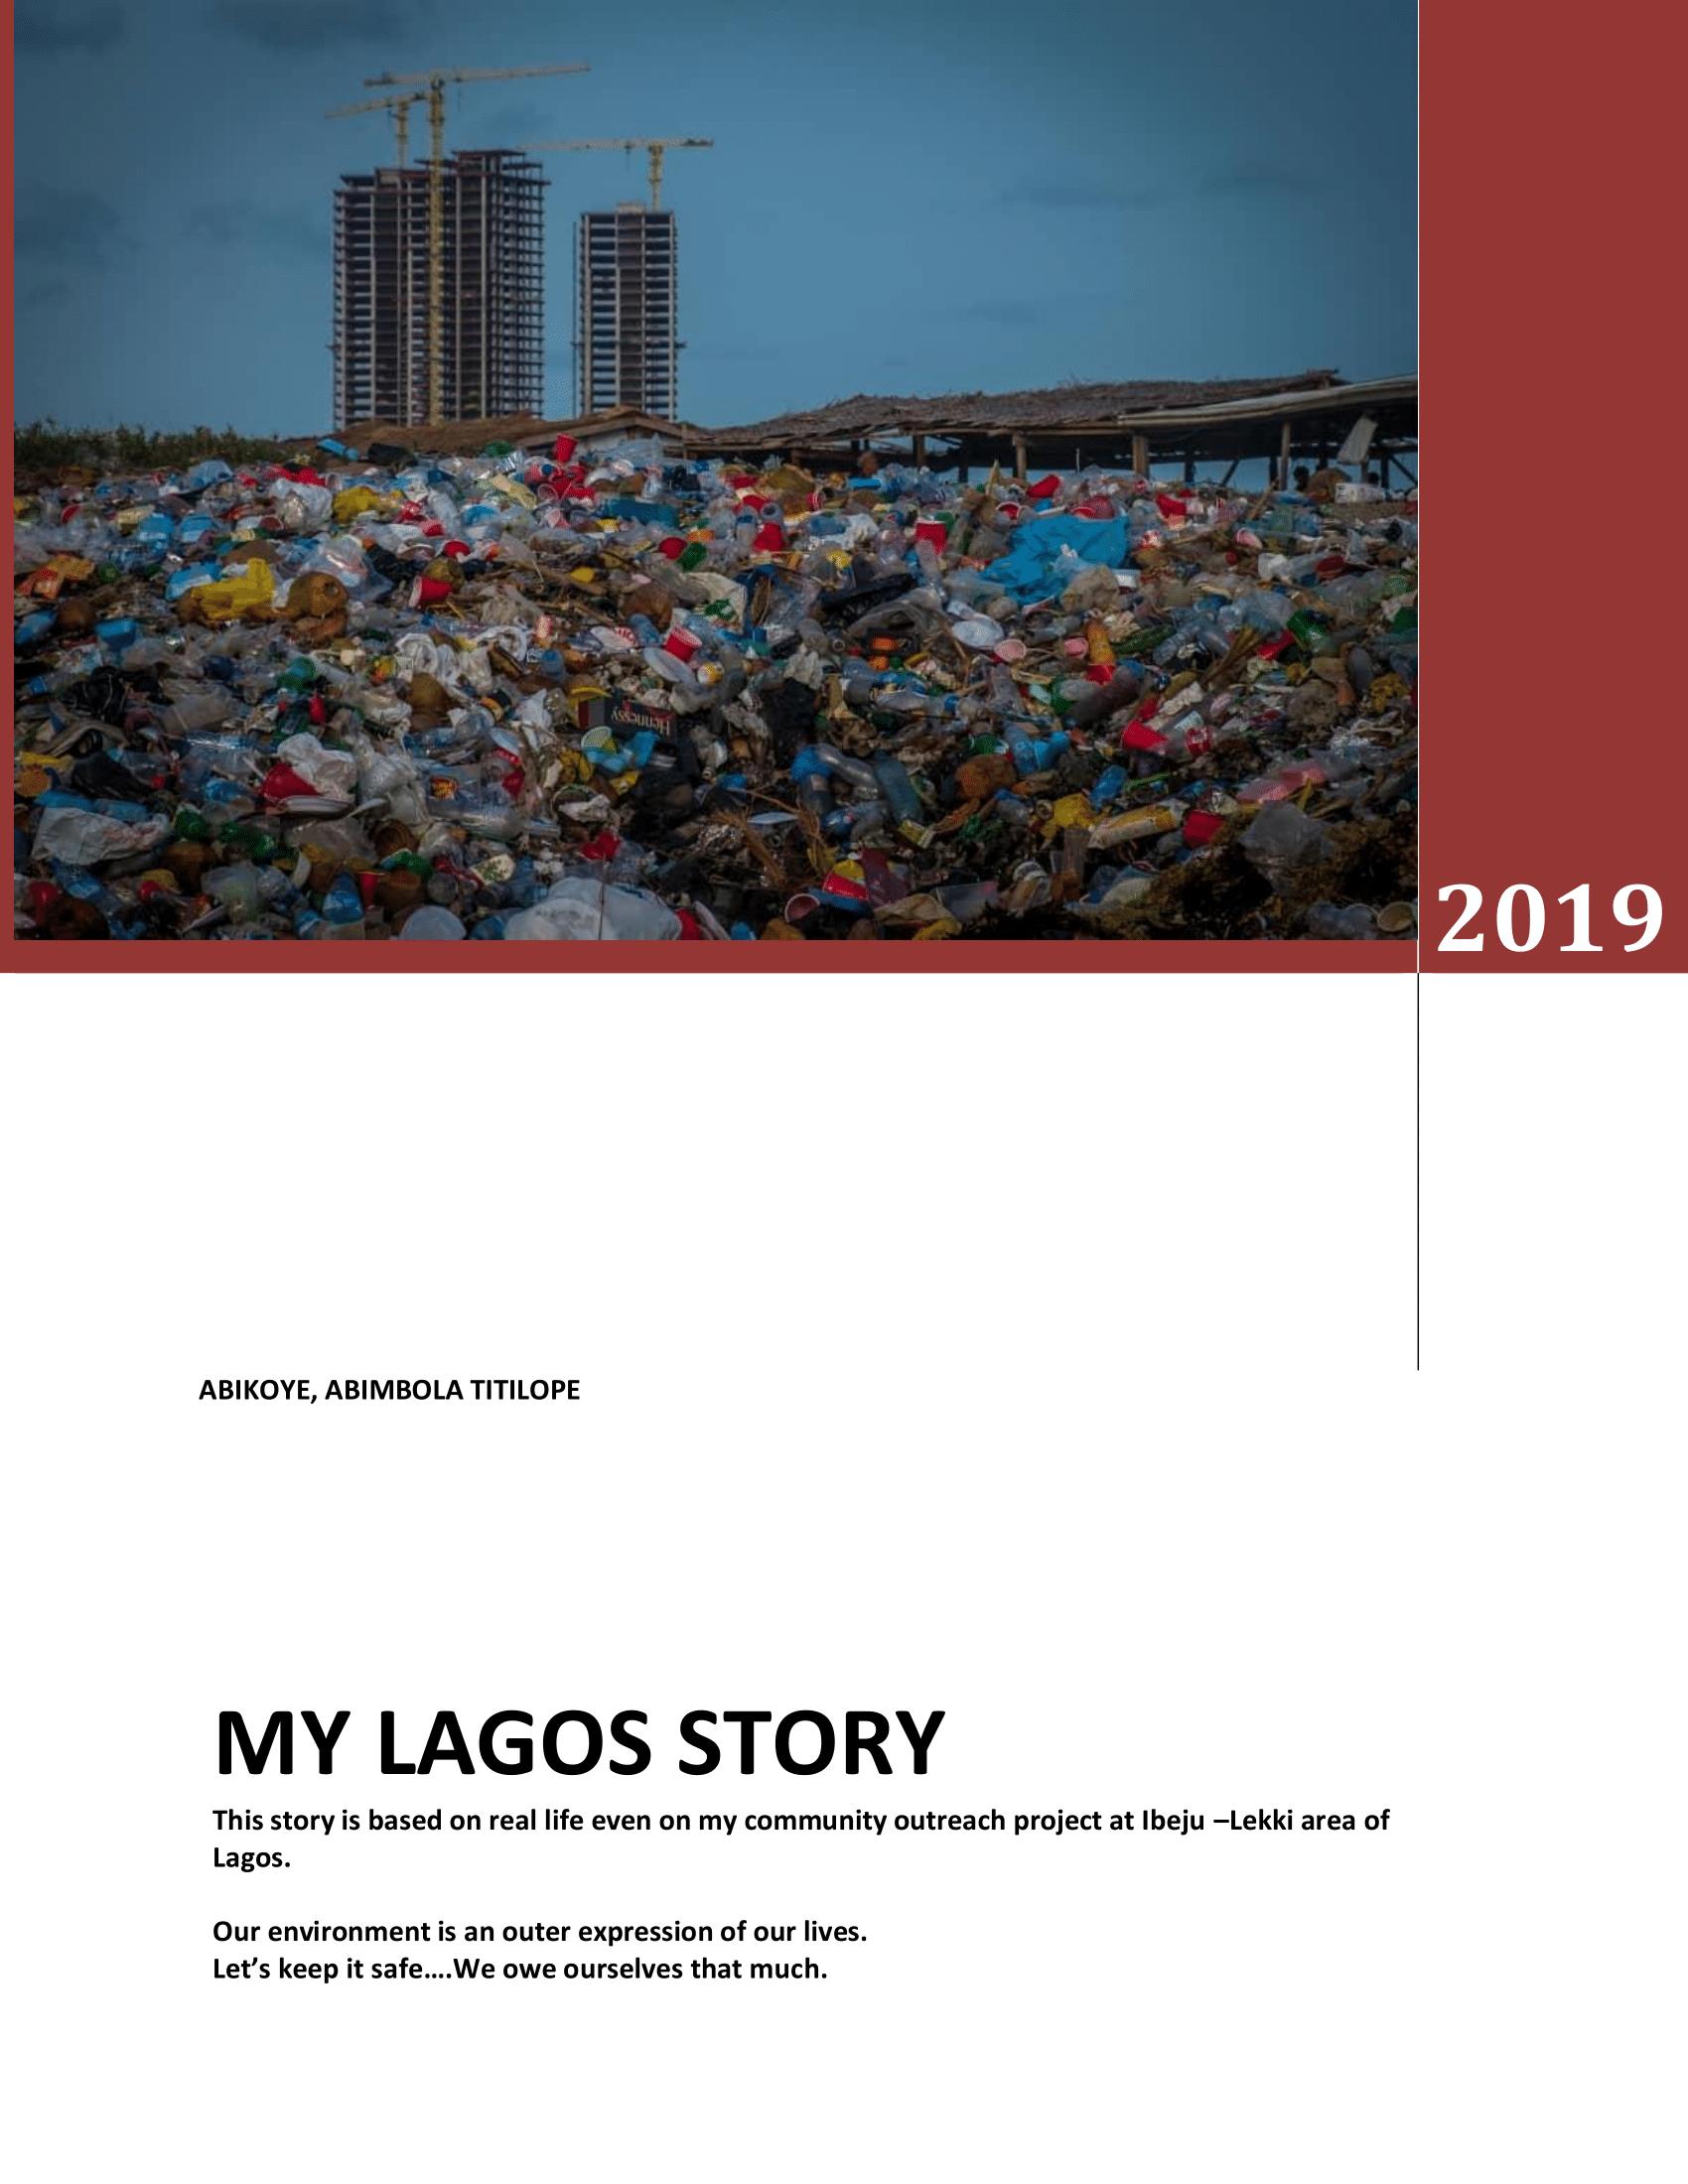 Abikoye Abimbola_Environmental Degredation - luceeyah Abikoye-01.png